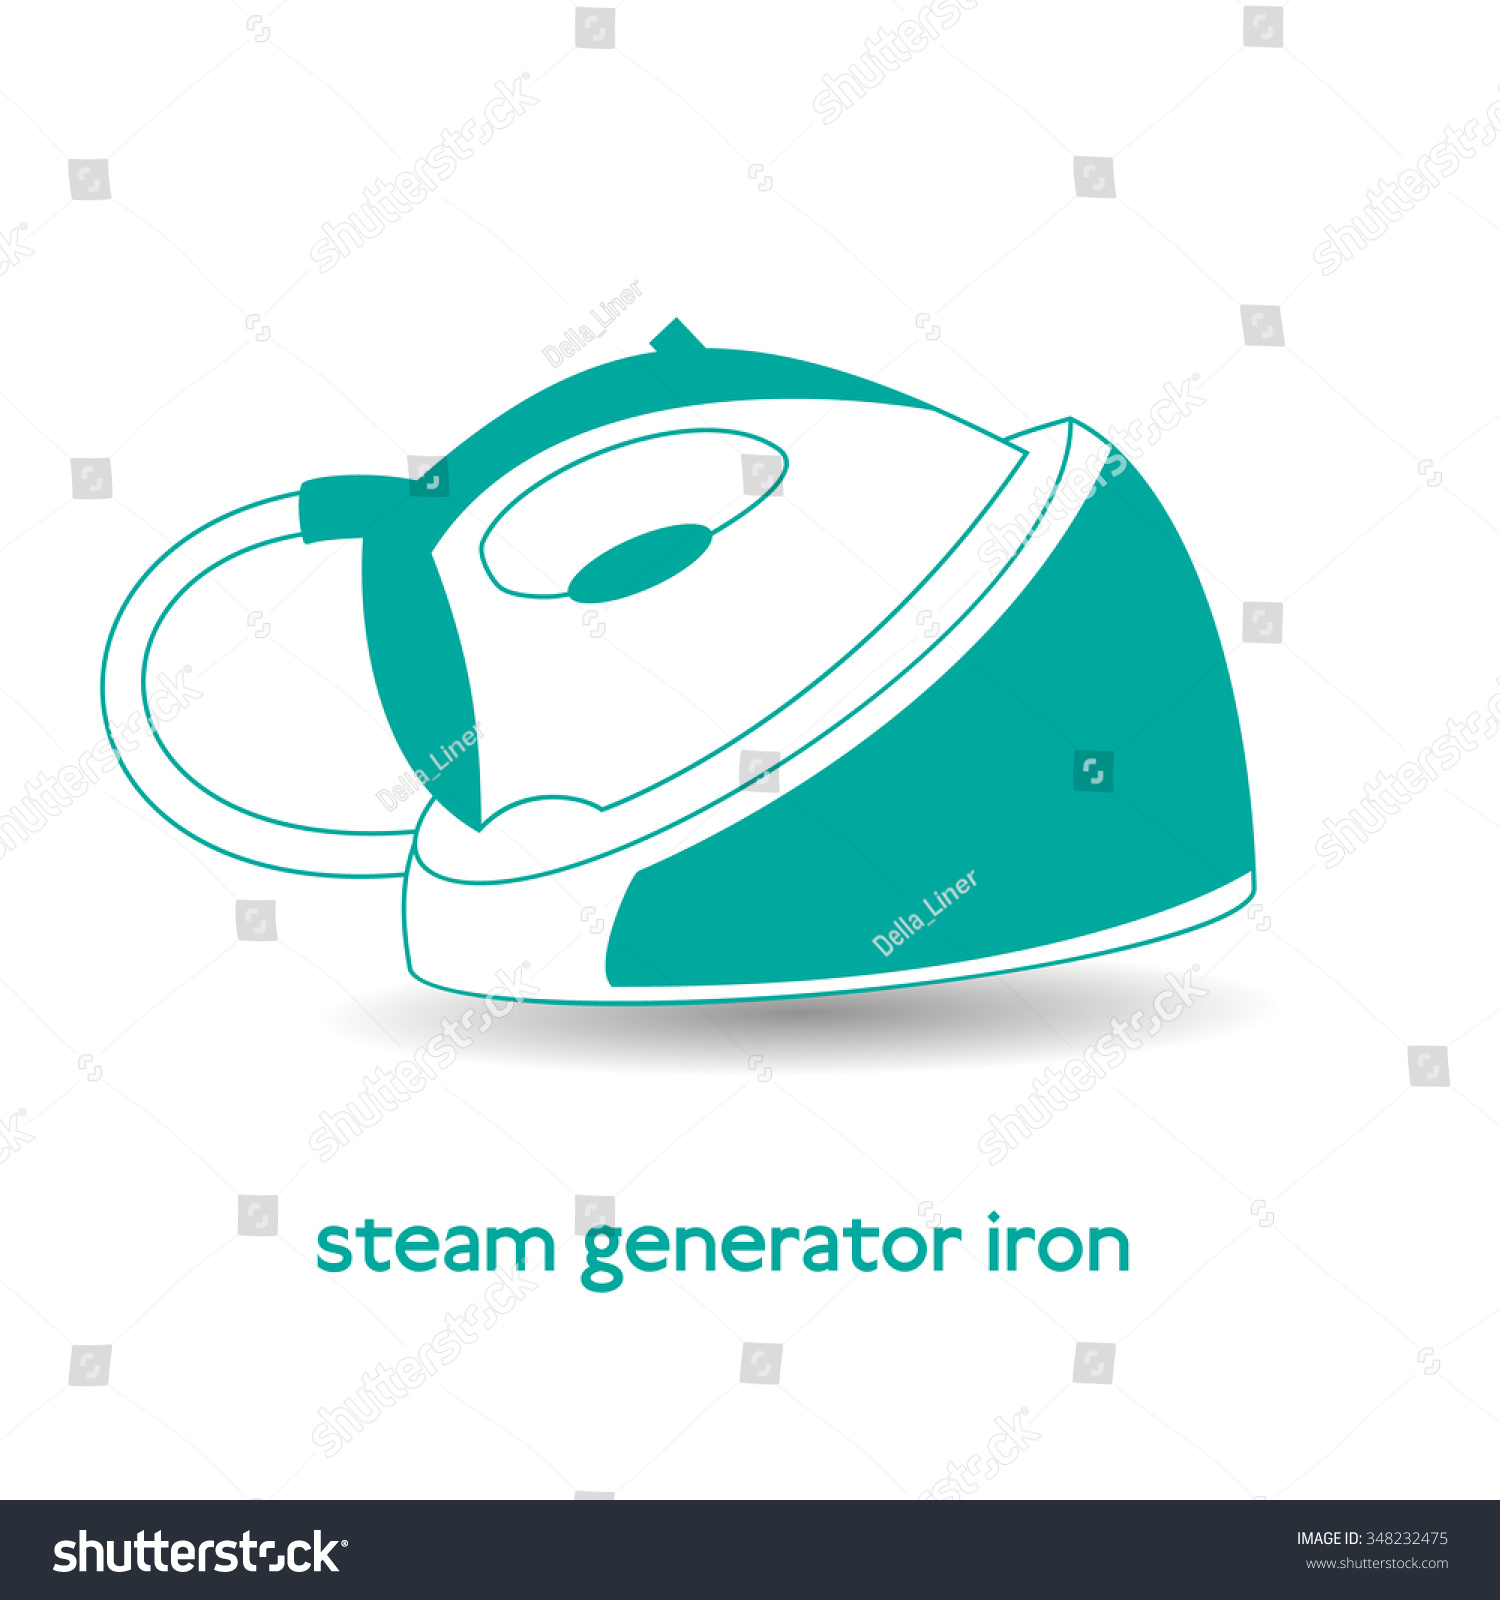 Steam Generator Iron Icon Isolated Stock Vector